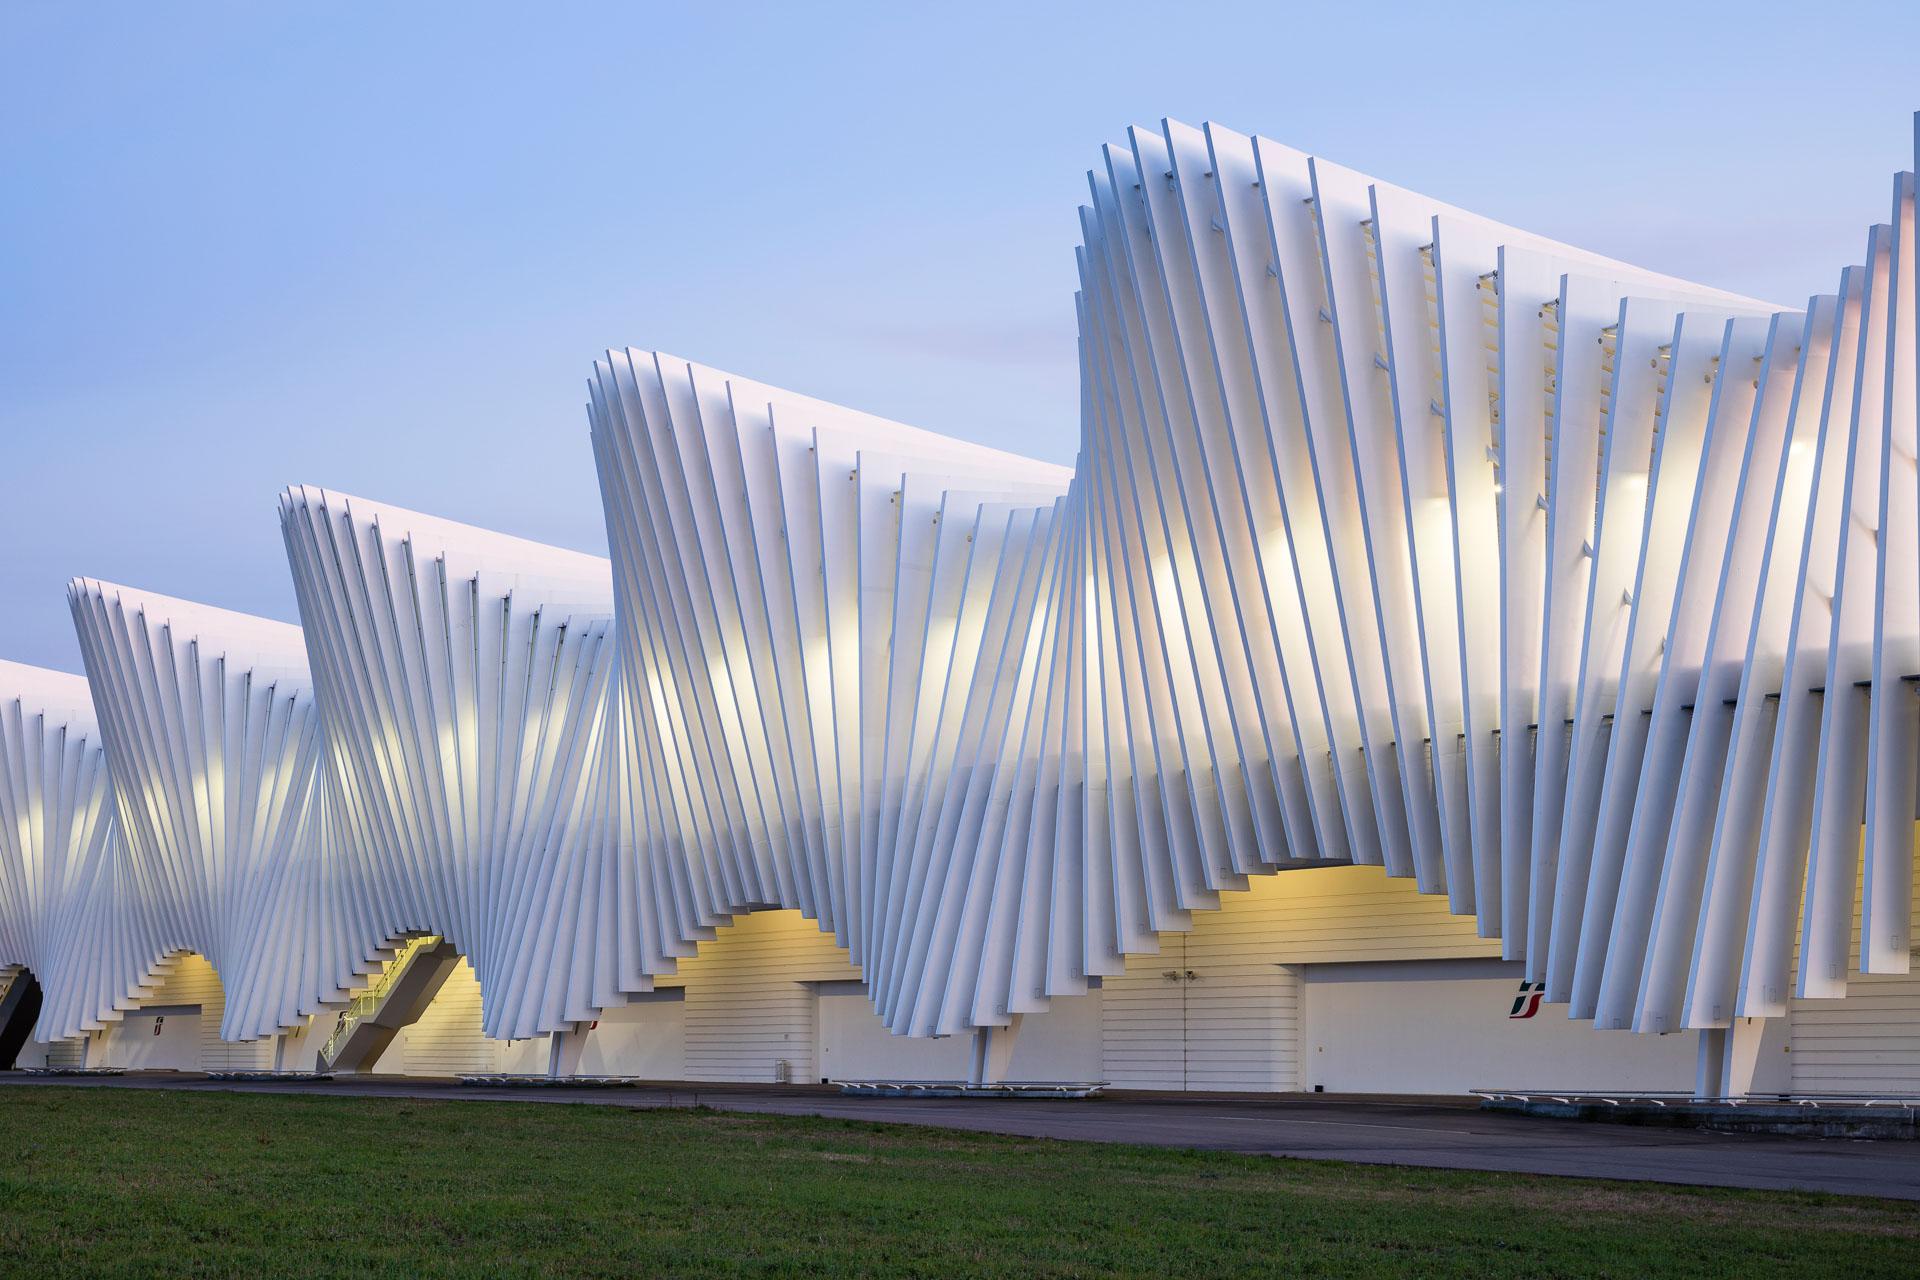 Reggio Emilia Stazione Mediopadana / Reggio Emilia (Gallery) - Santiago  Calatrava – Architects & Engineers